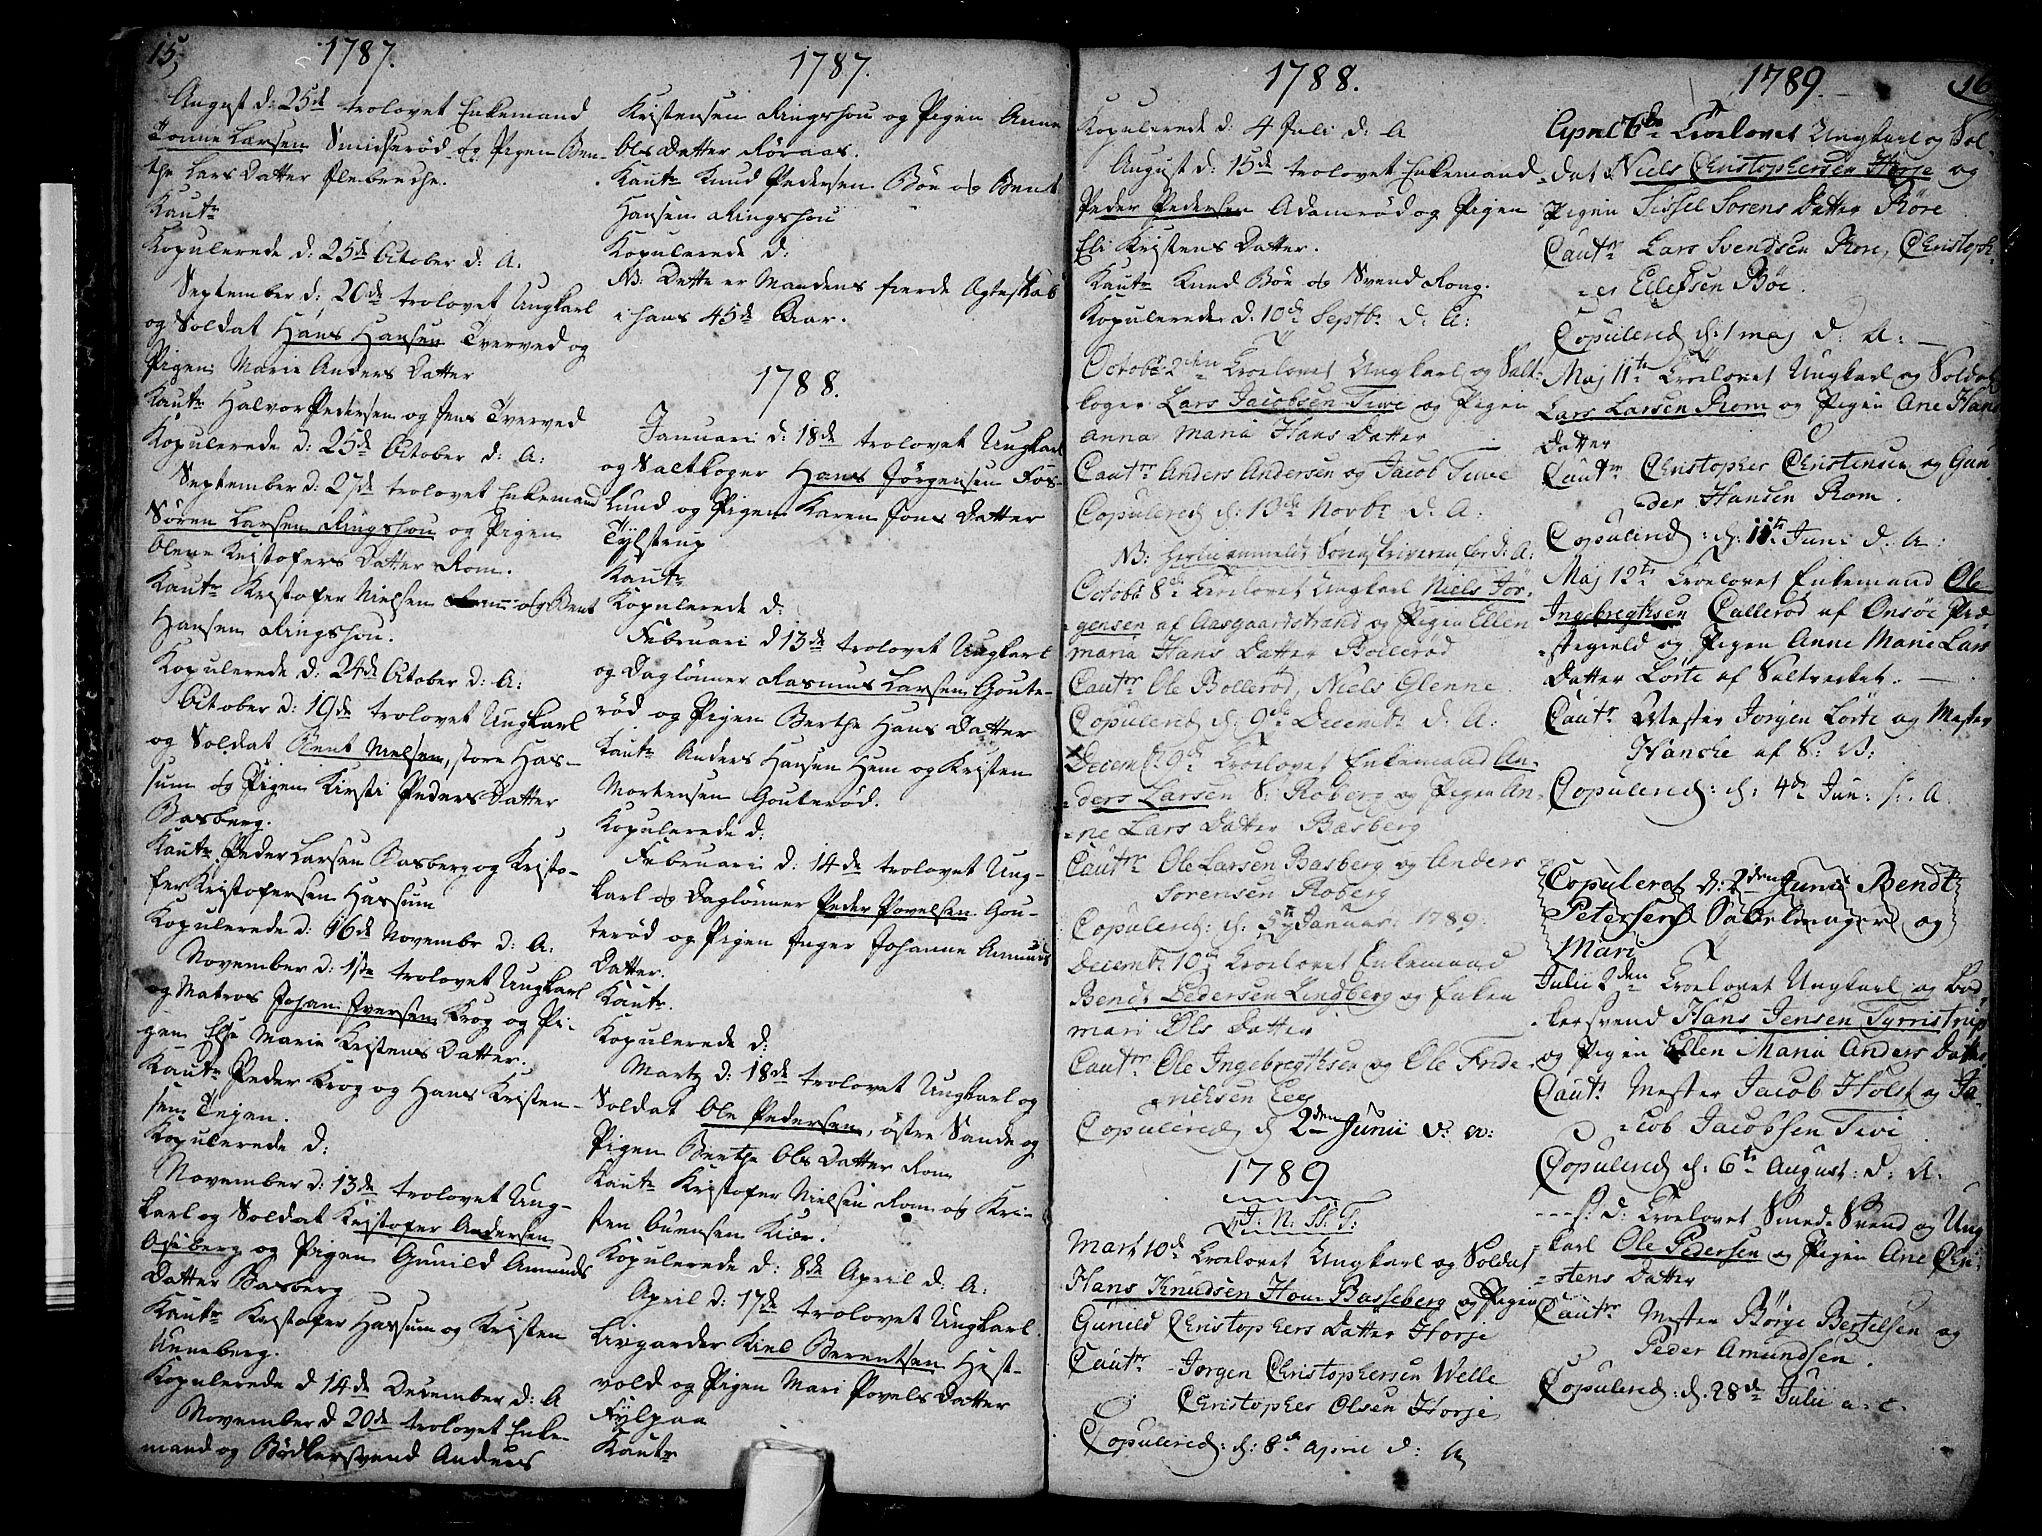 SAKO, Sem kirkebøker, F/Fb/L0002: Ministerialbok nr. II 2, 1764-1792, s. 15-16